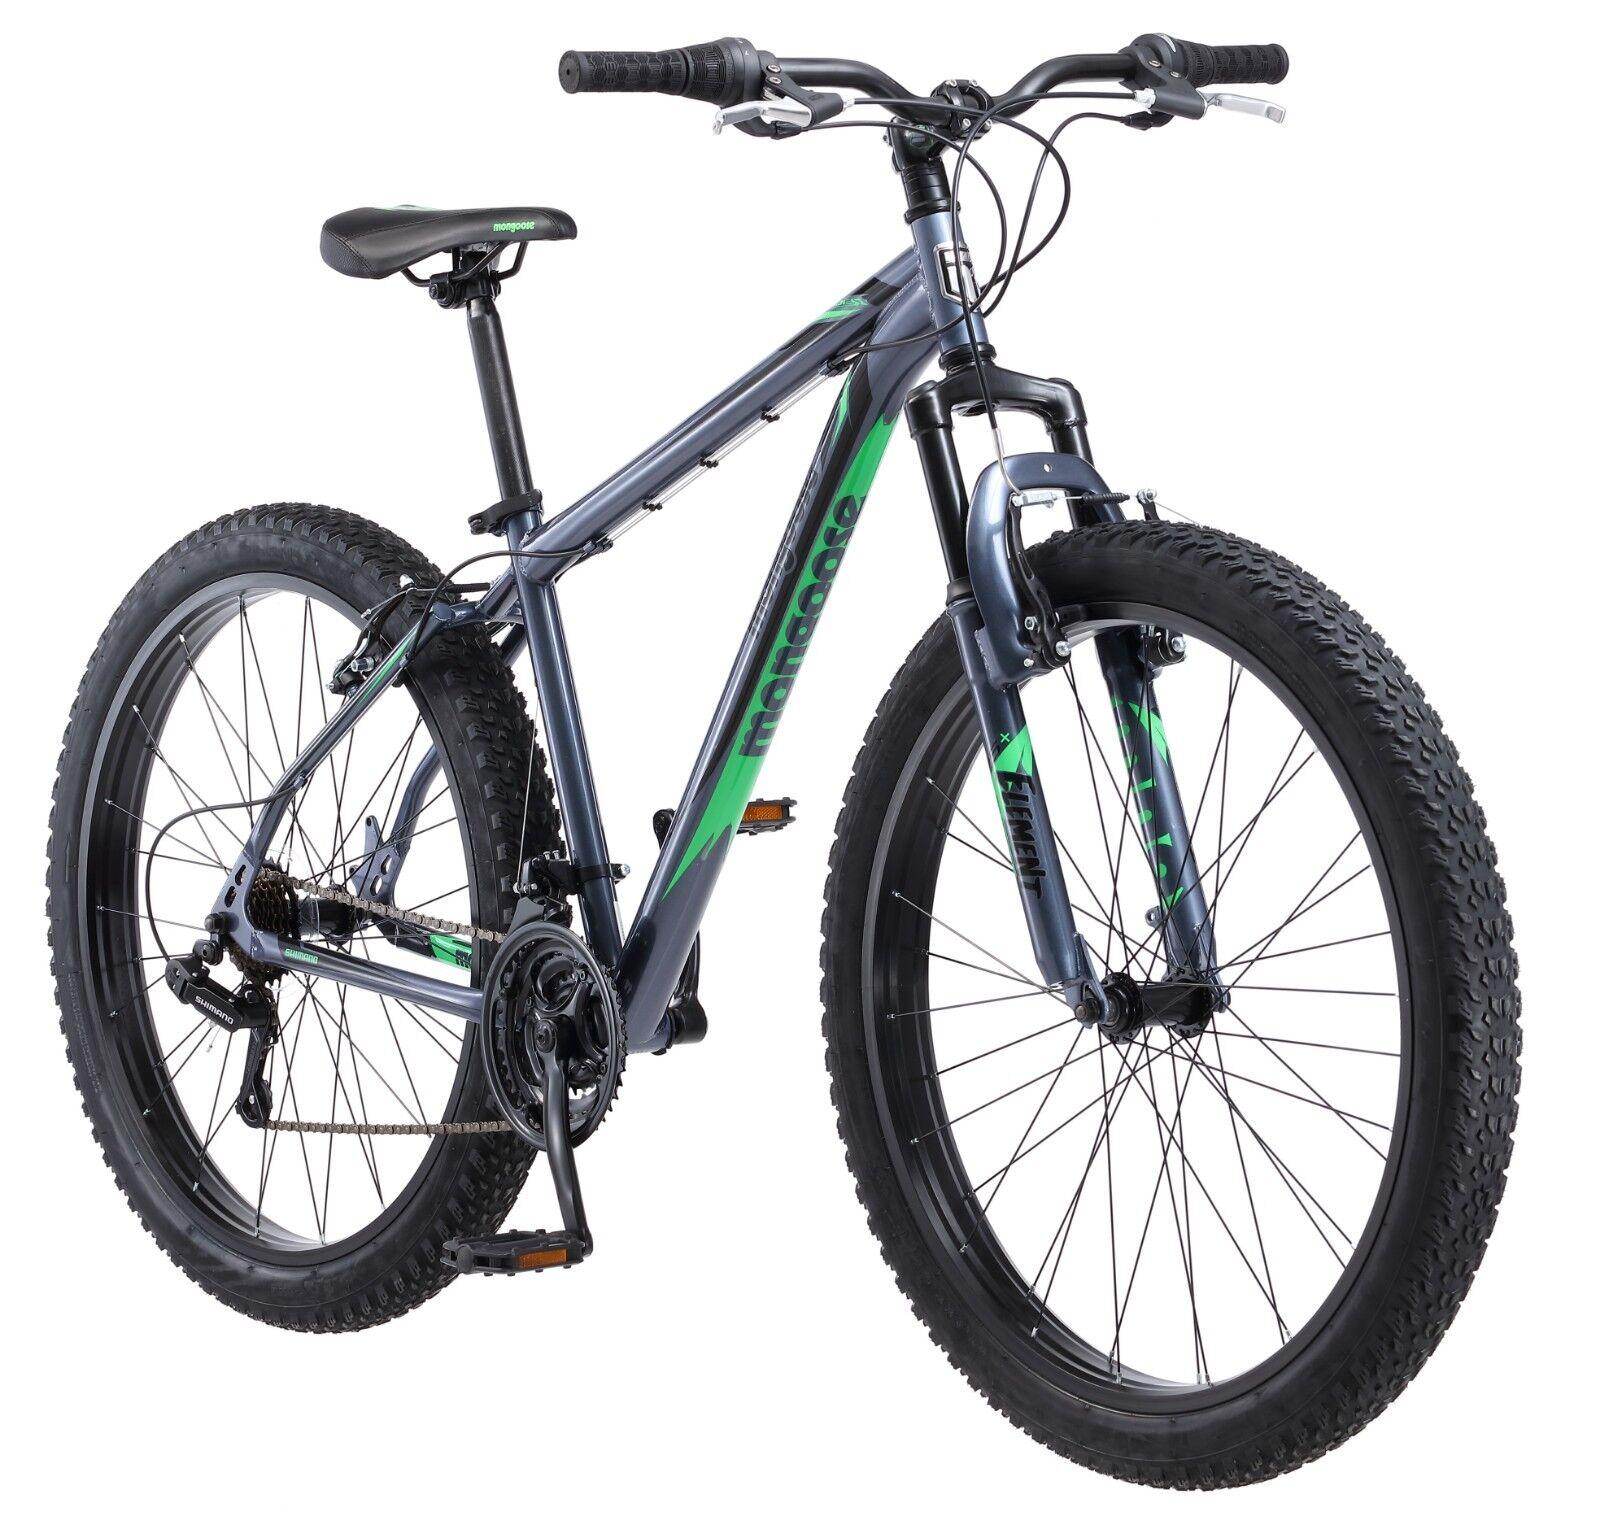 "Mongoose 27.5"" Men's Rader Bike in Grey R5904A"